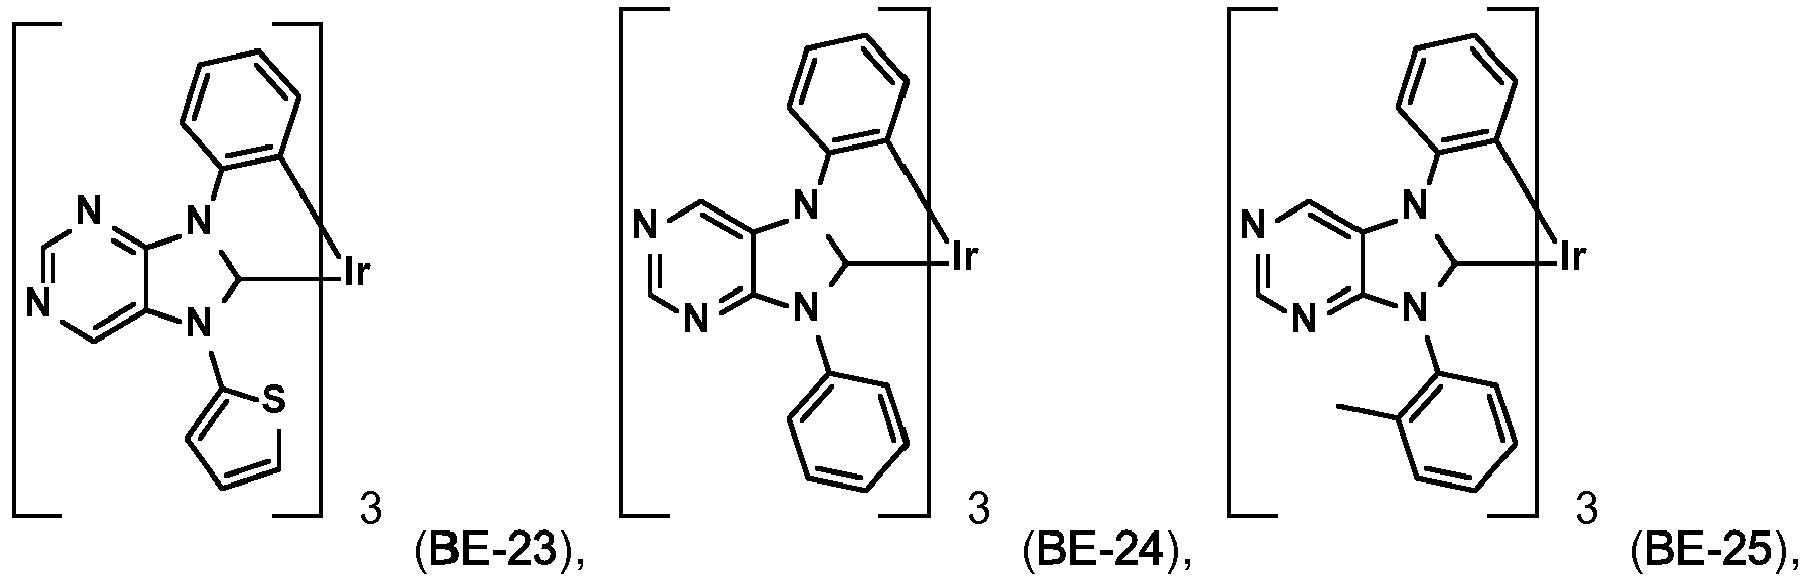 Figure imgb0760